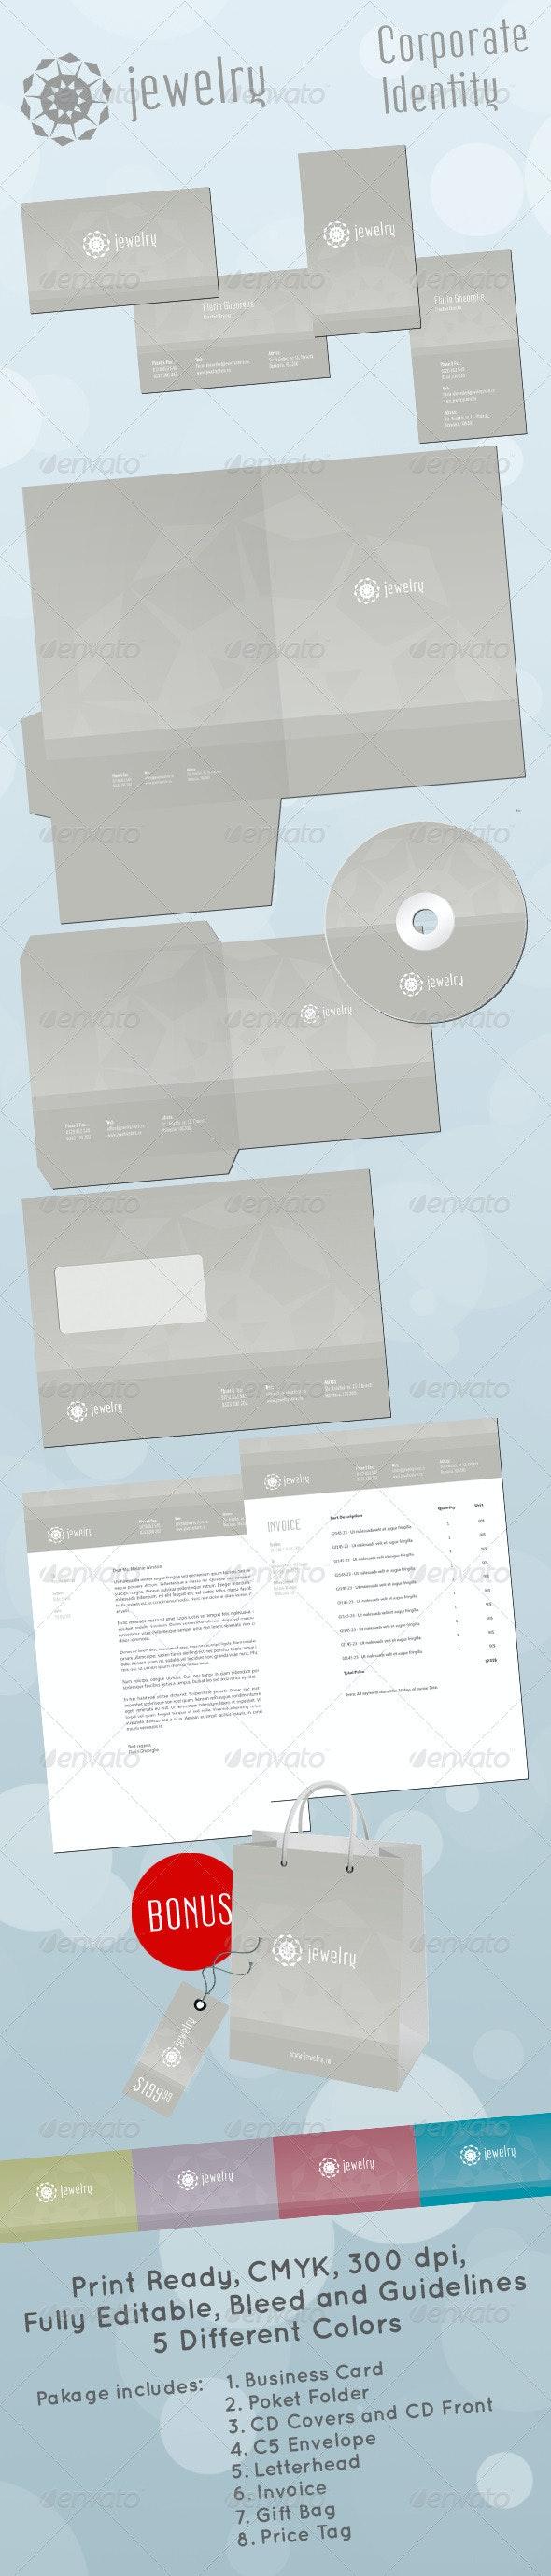 Jewelry Store Corporate Identity - Stationery Print Templates